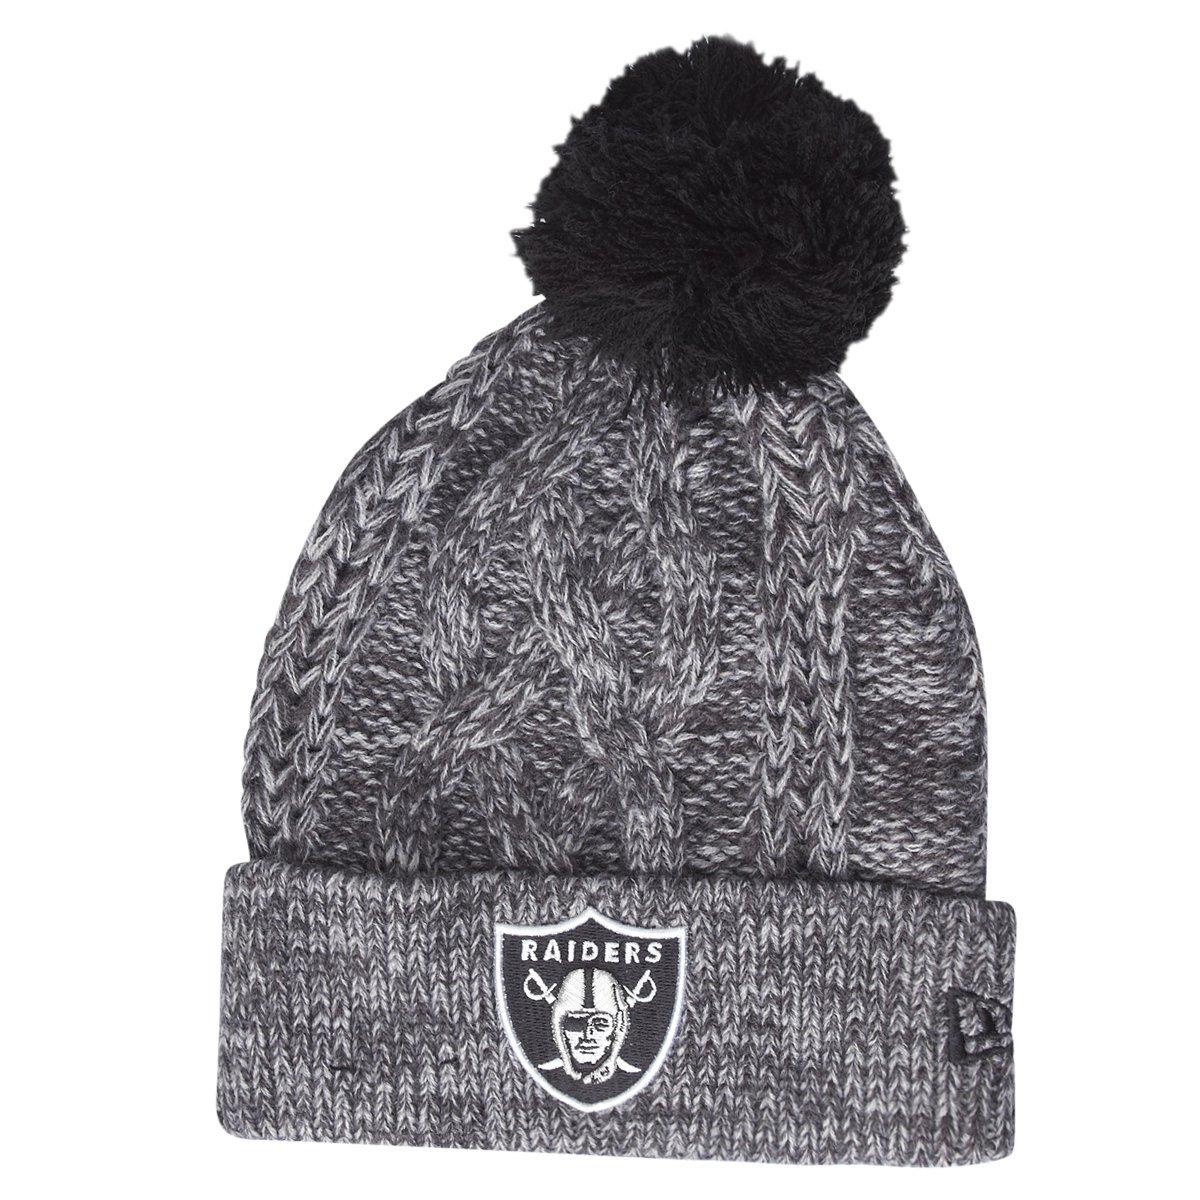 44b24260 New Era Oakland Raiders Beanie One Size Black